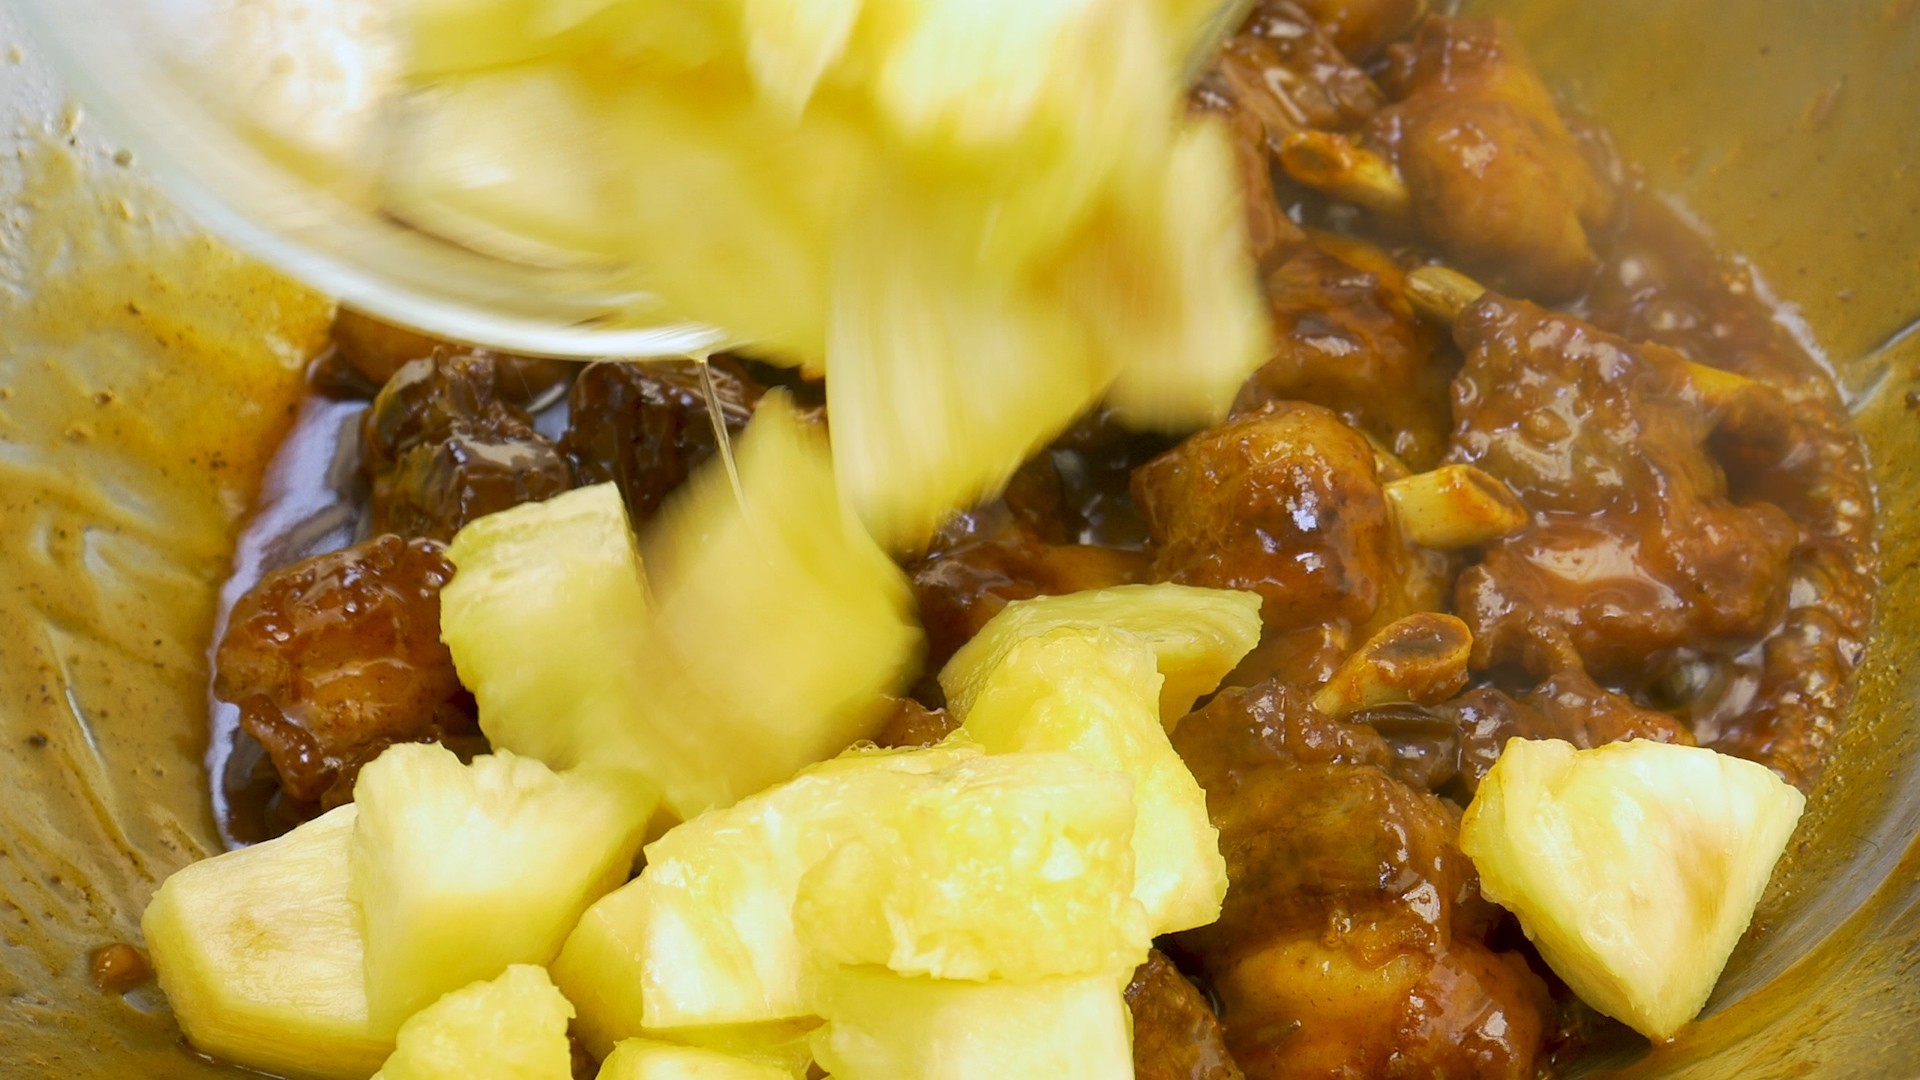 Pineapple Meaty Pork Ribs Pic5